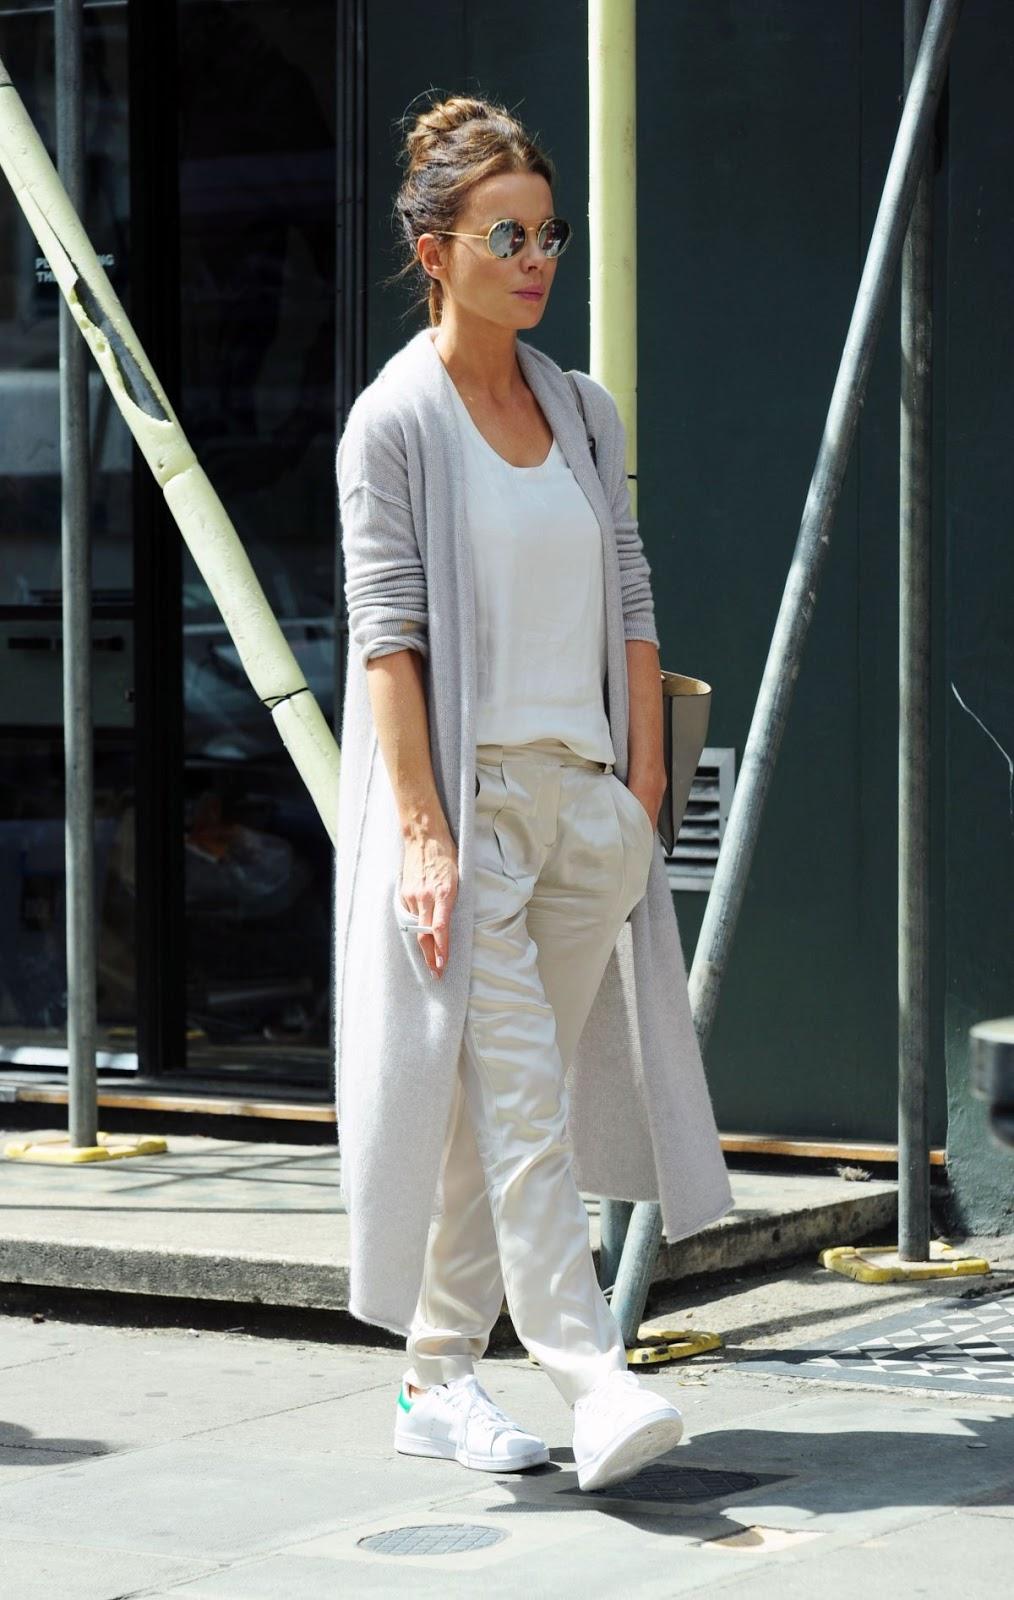 Kate Beckinsale Smoking during Shopping at Notting Hill in London